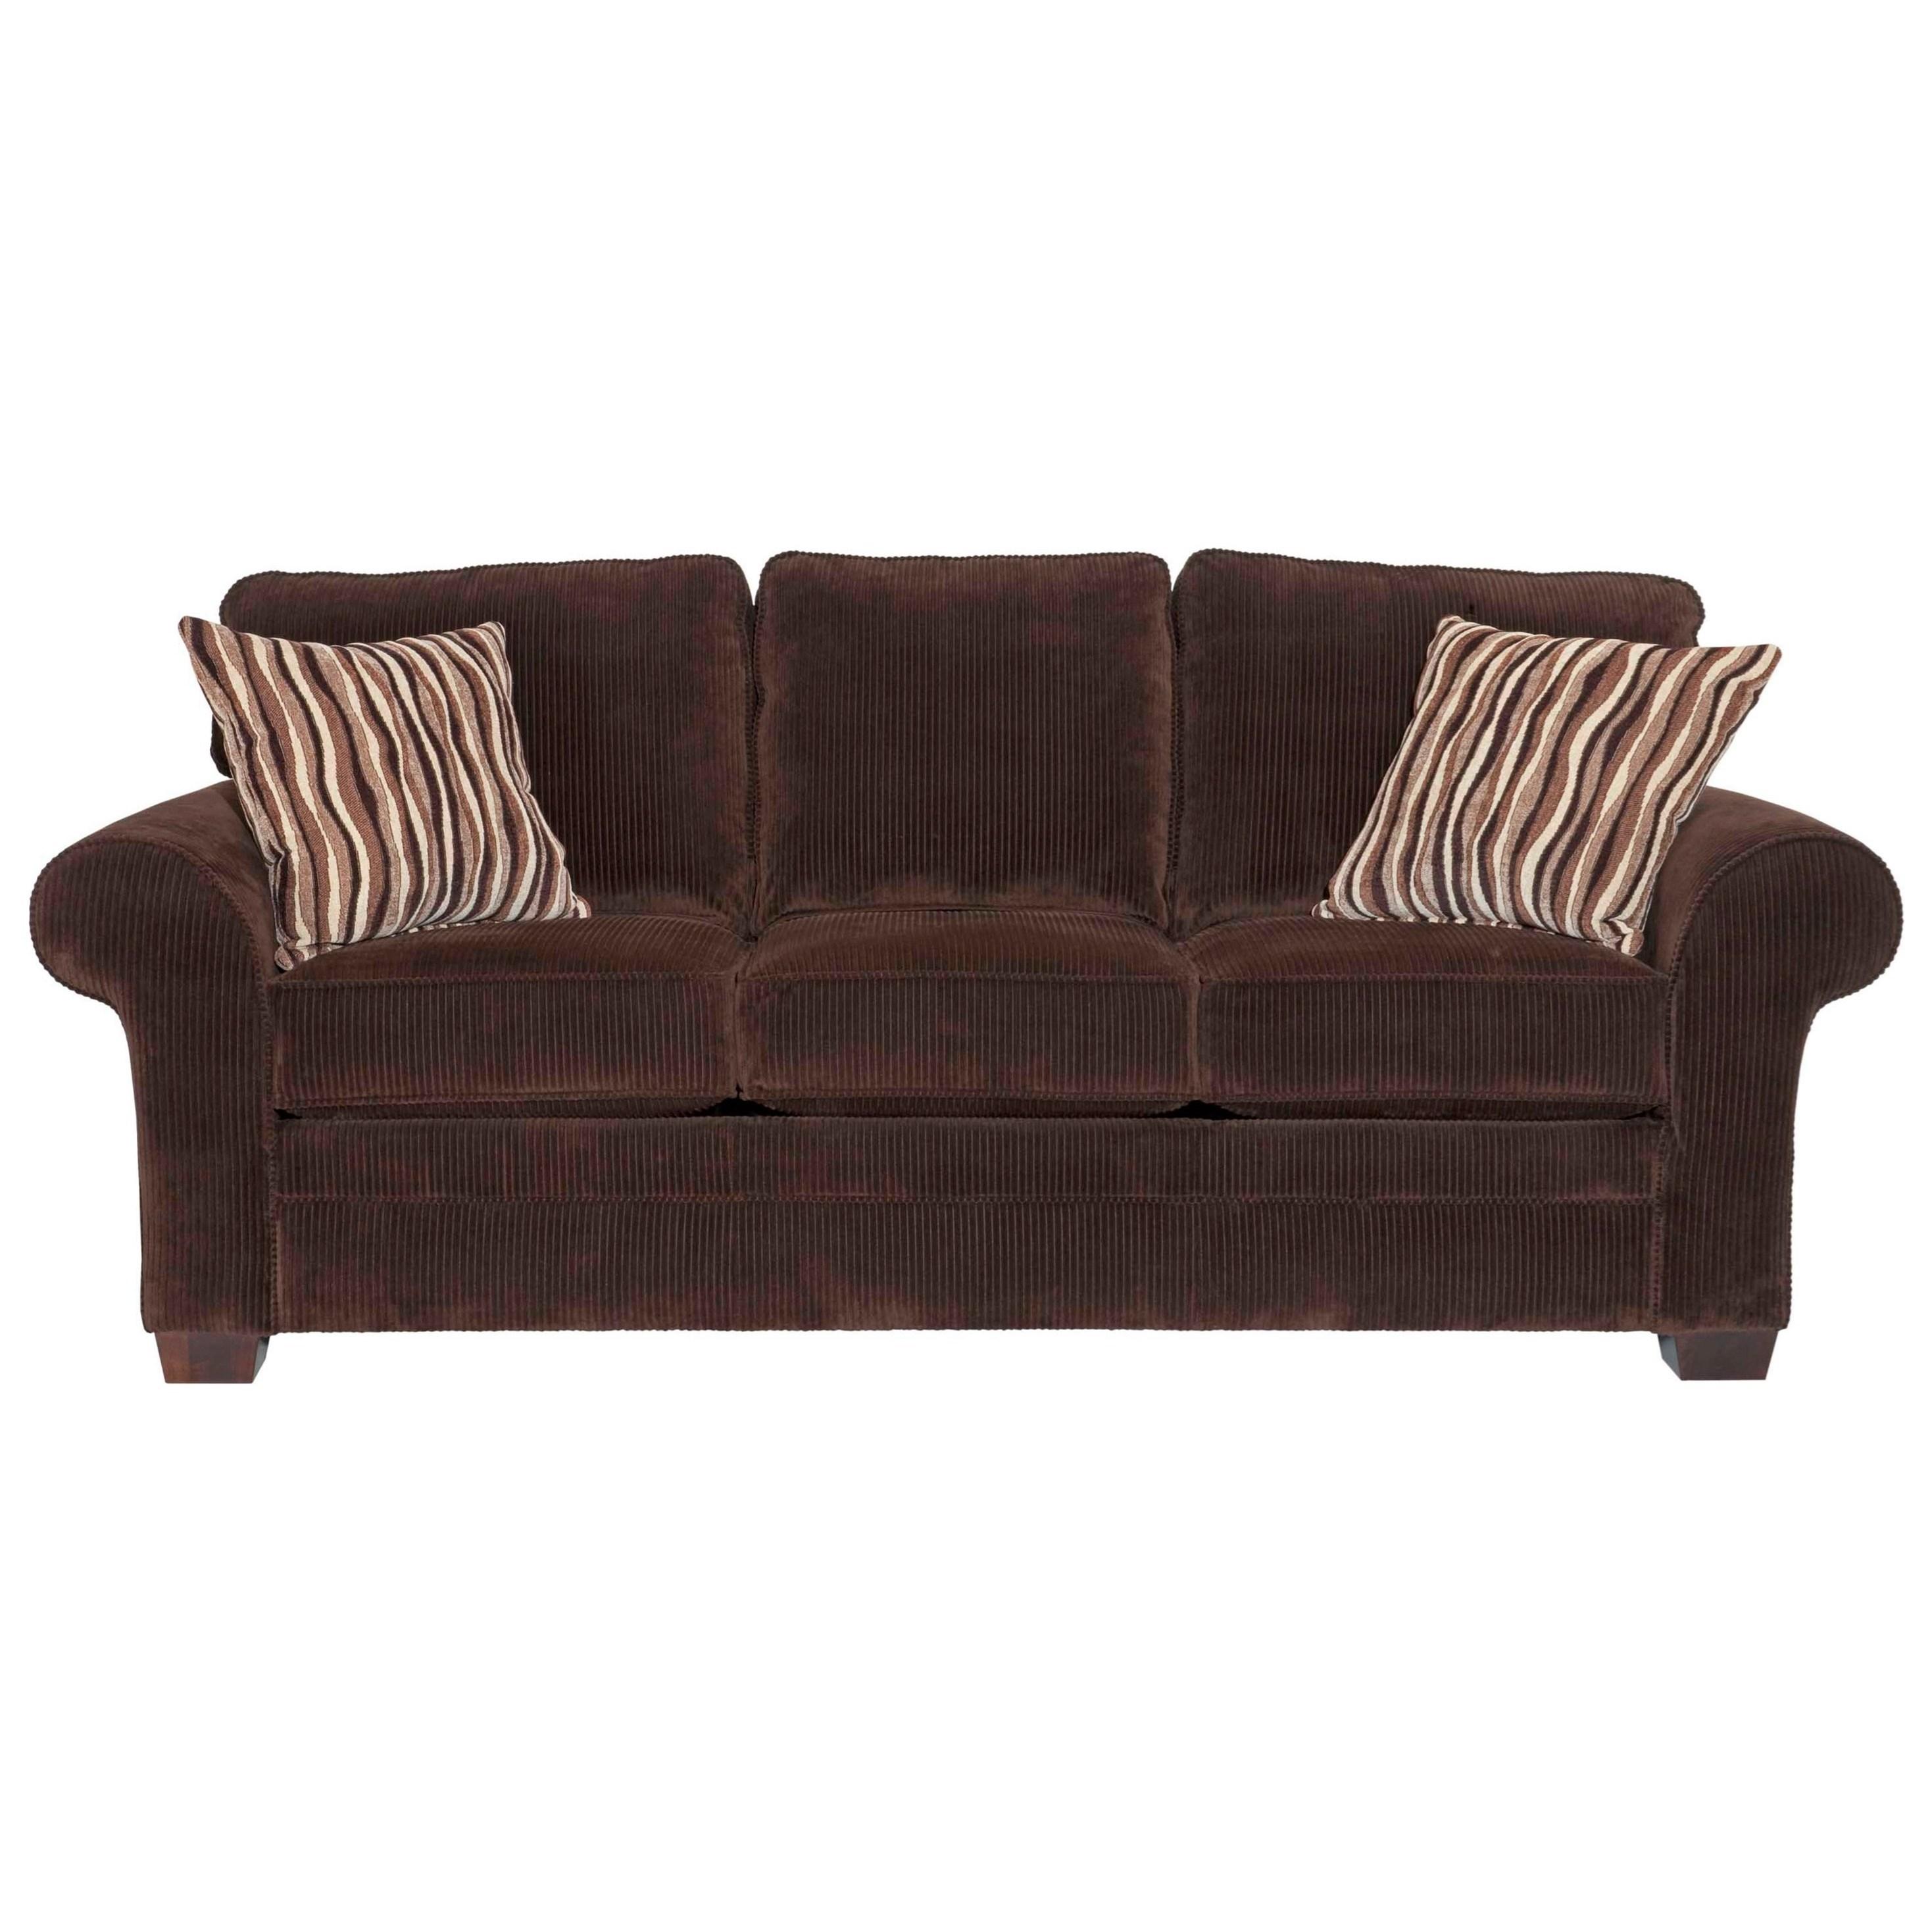 Broyhill Furniture Zachary Queen Goodnight Sleeper Conlin 39 S Furniture Sleeper Sofas